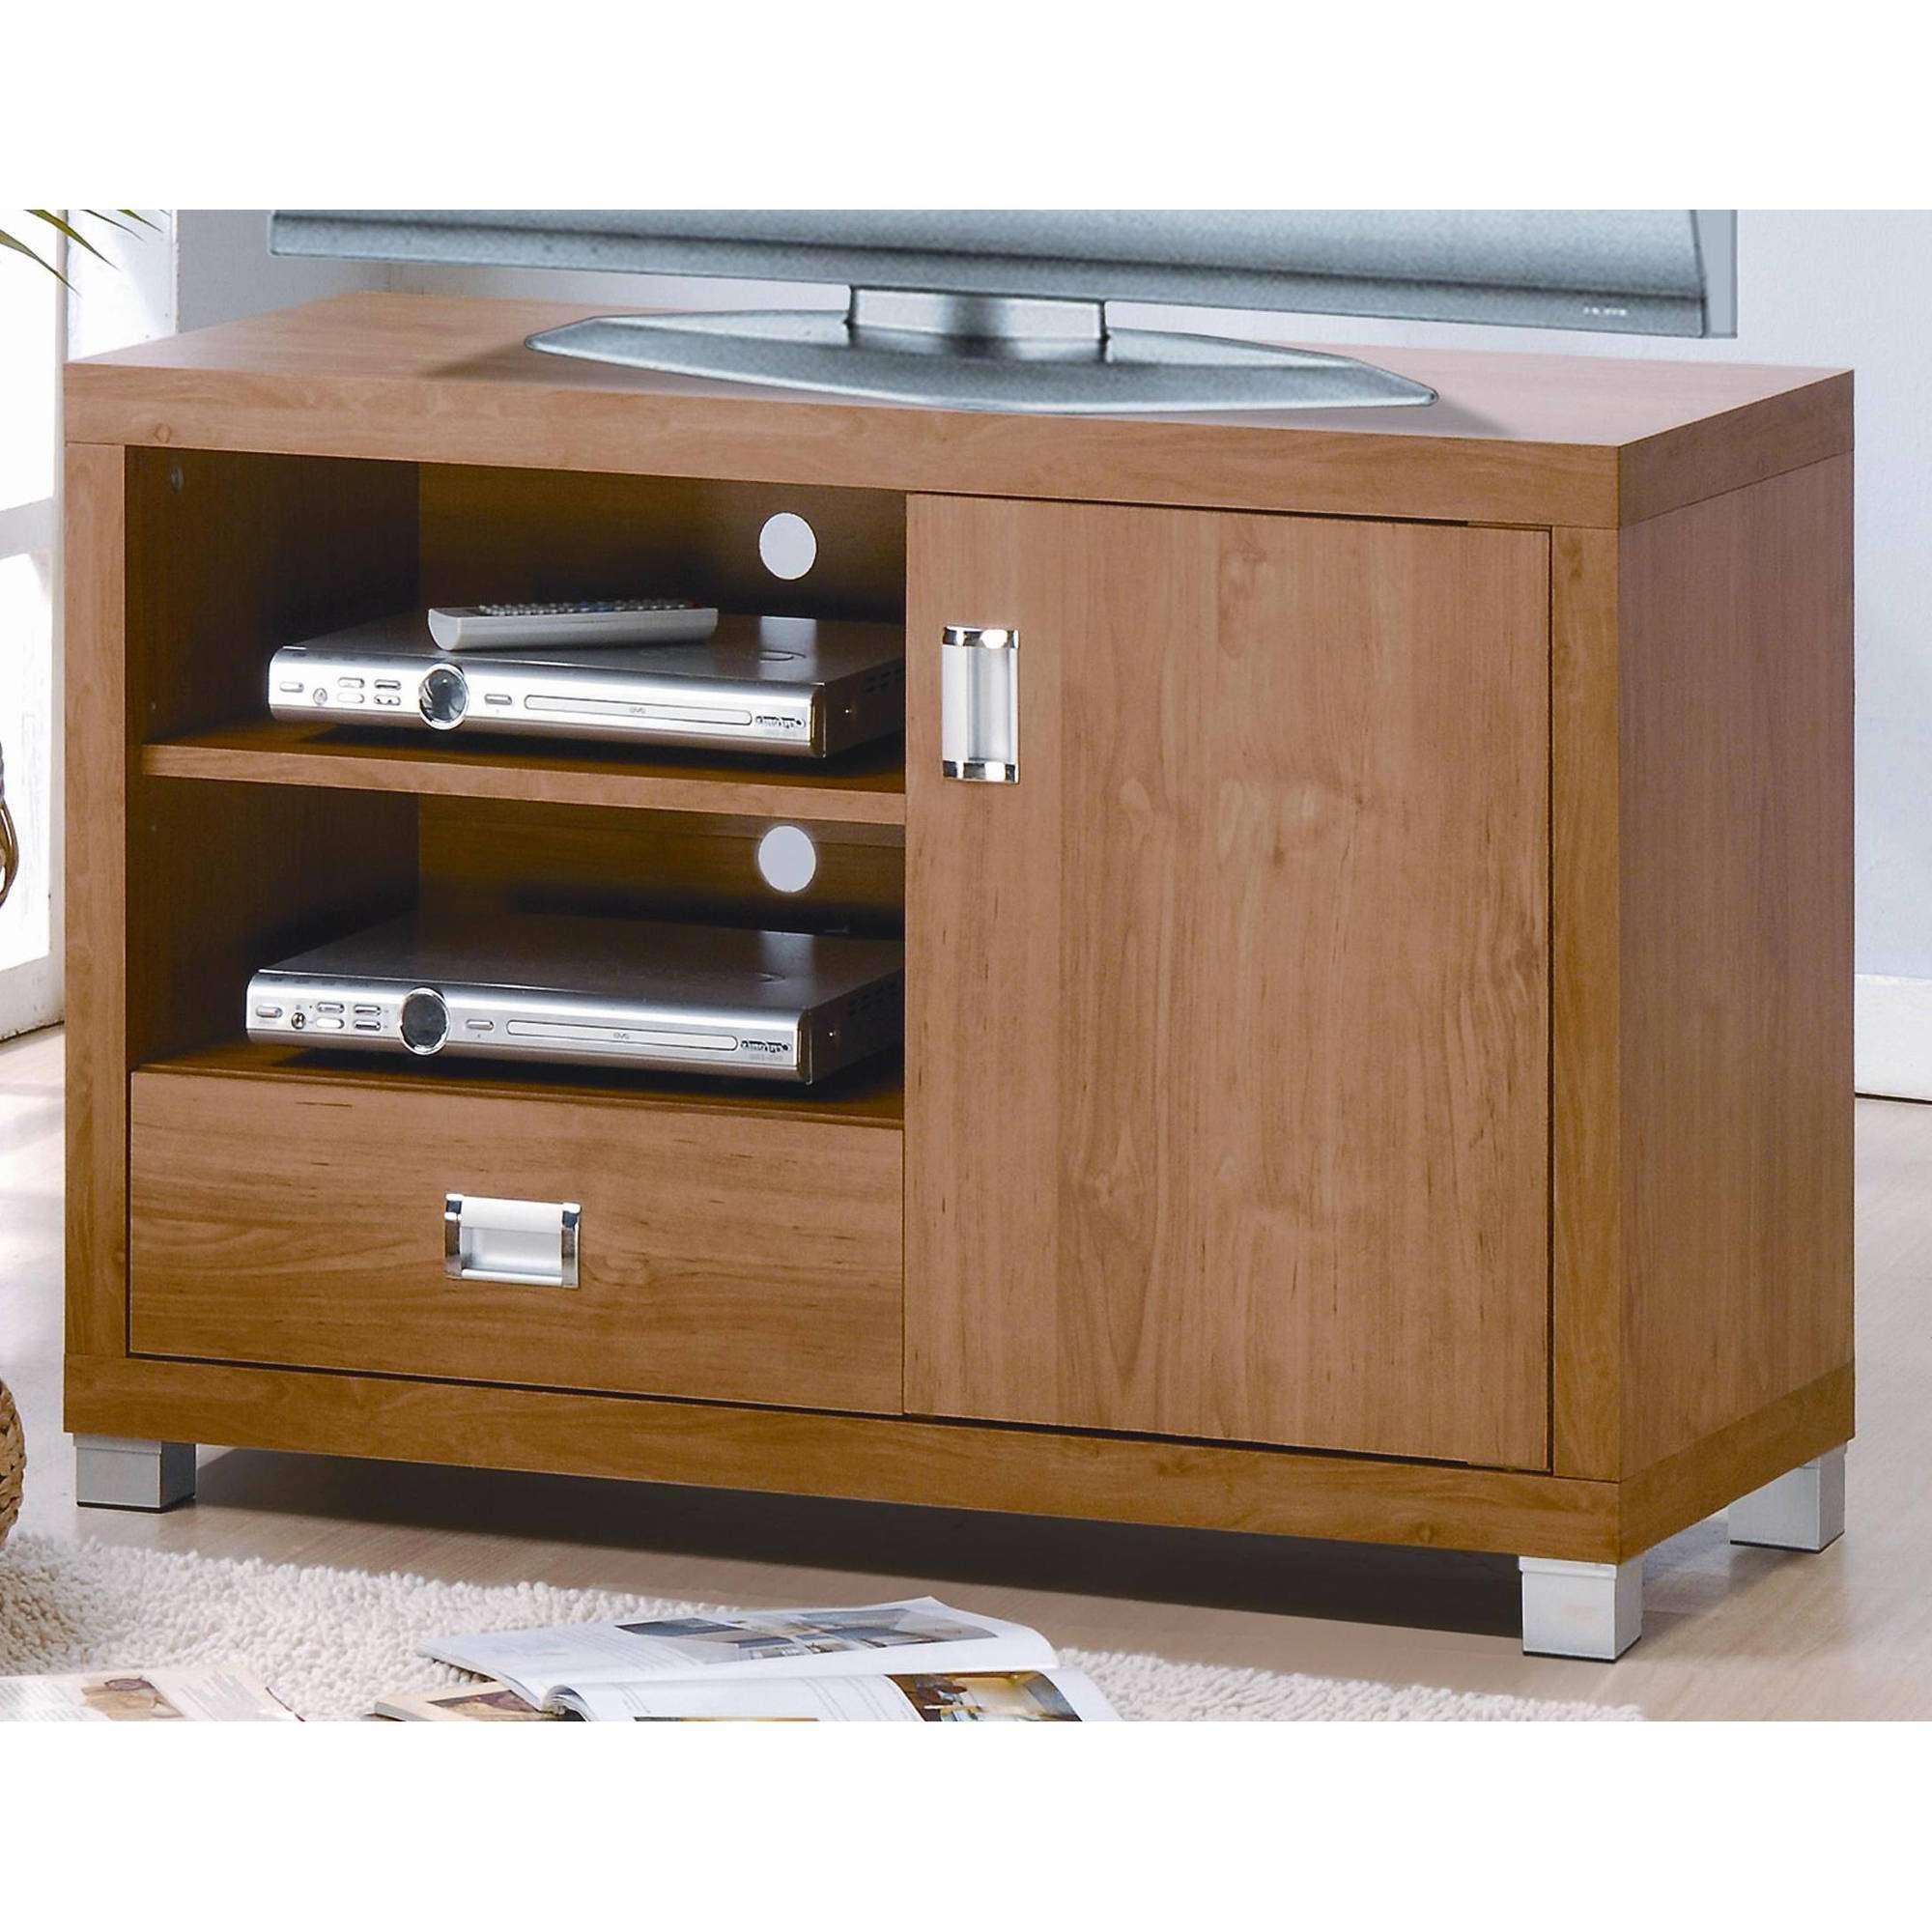 Techni Mobili Tv Cabinet, Maple – Walmart For Maple Tv Cabinets (View 16 of 20)